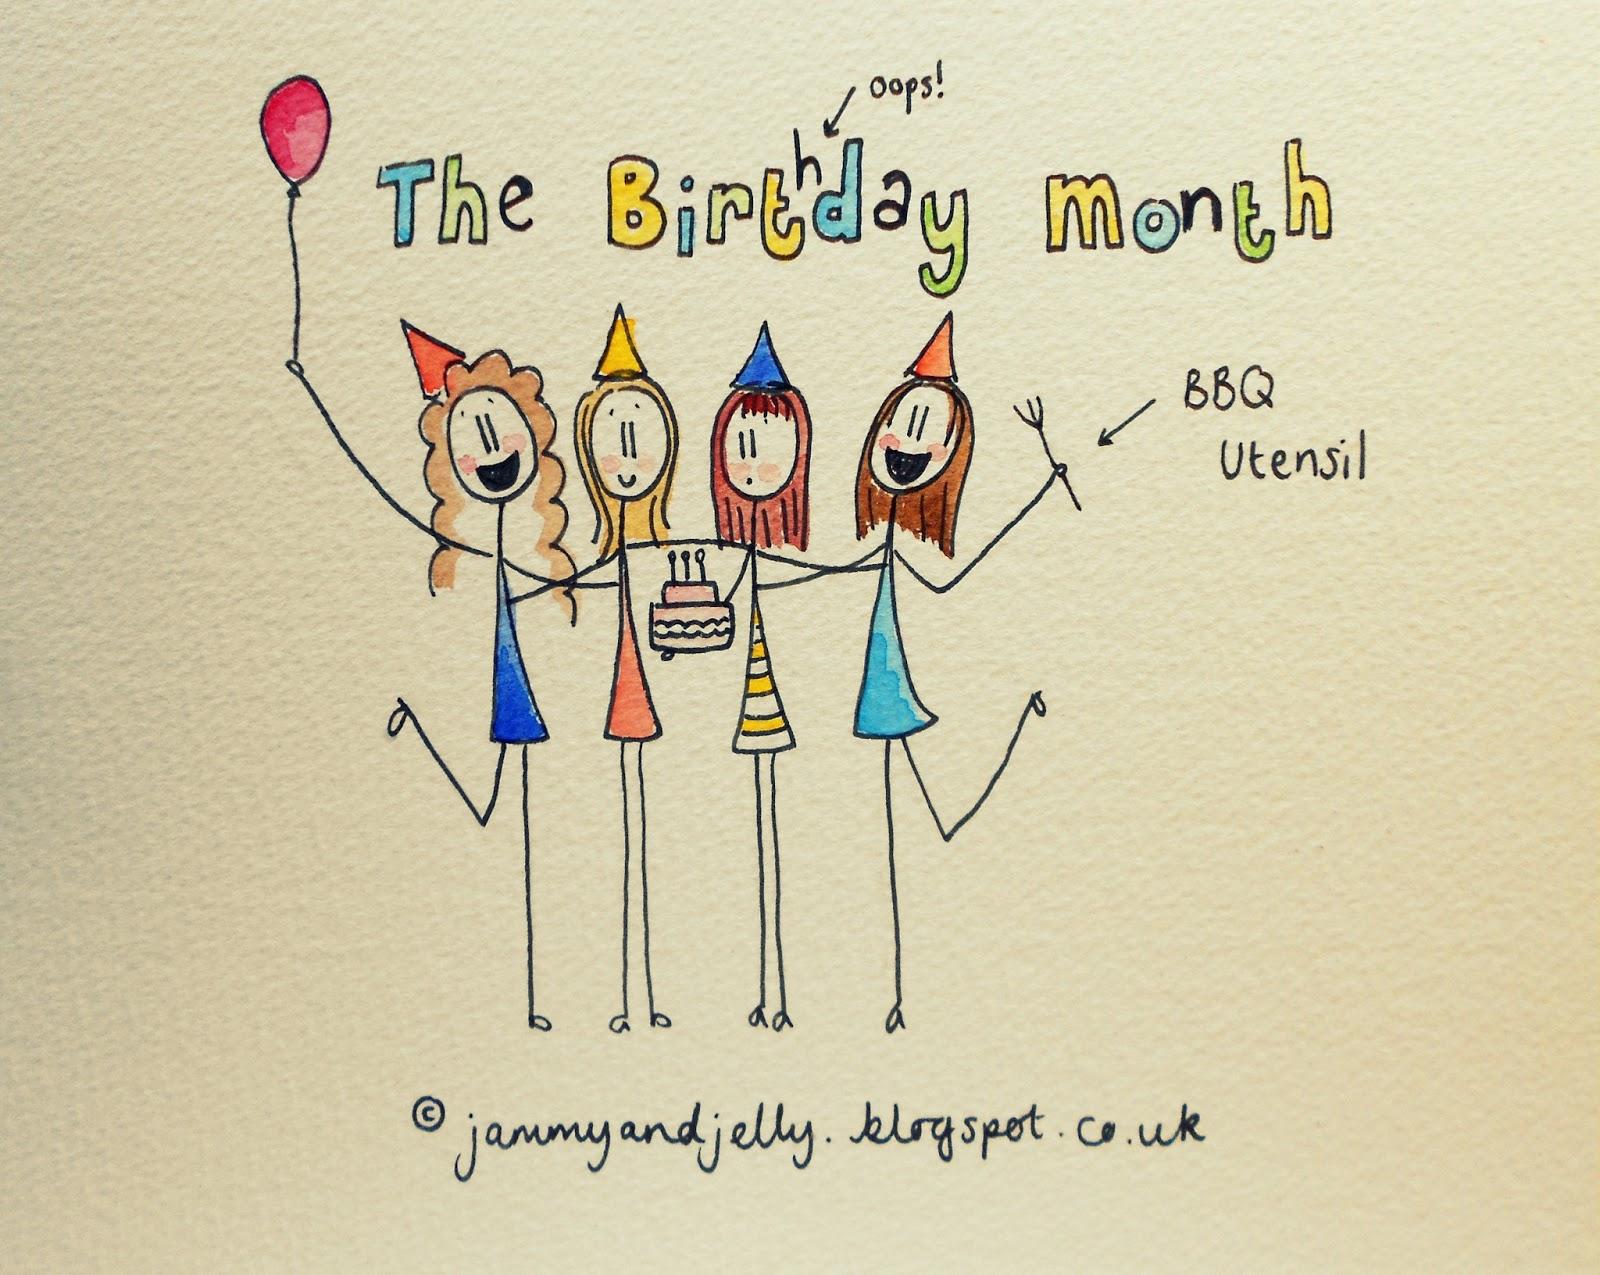 August birthday month my august birthday month quotes quotesgram - Bbq Birthday